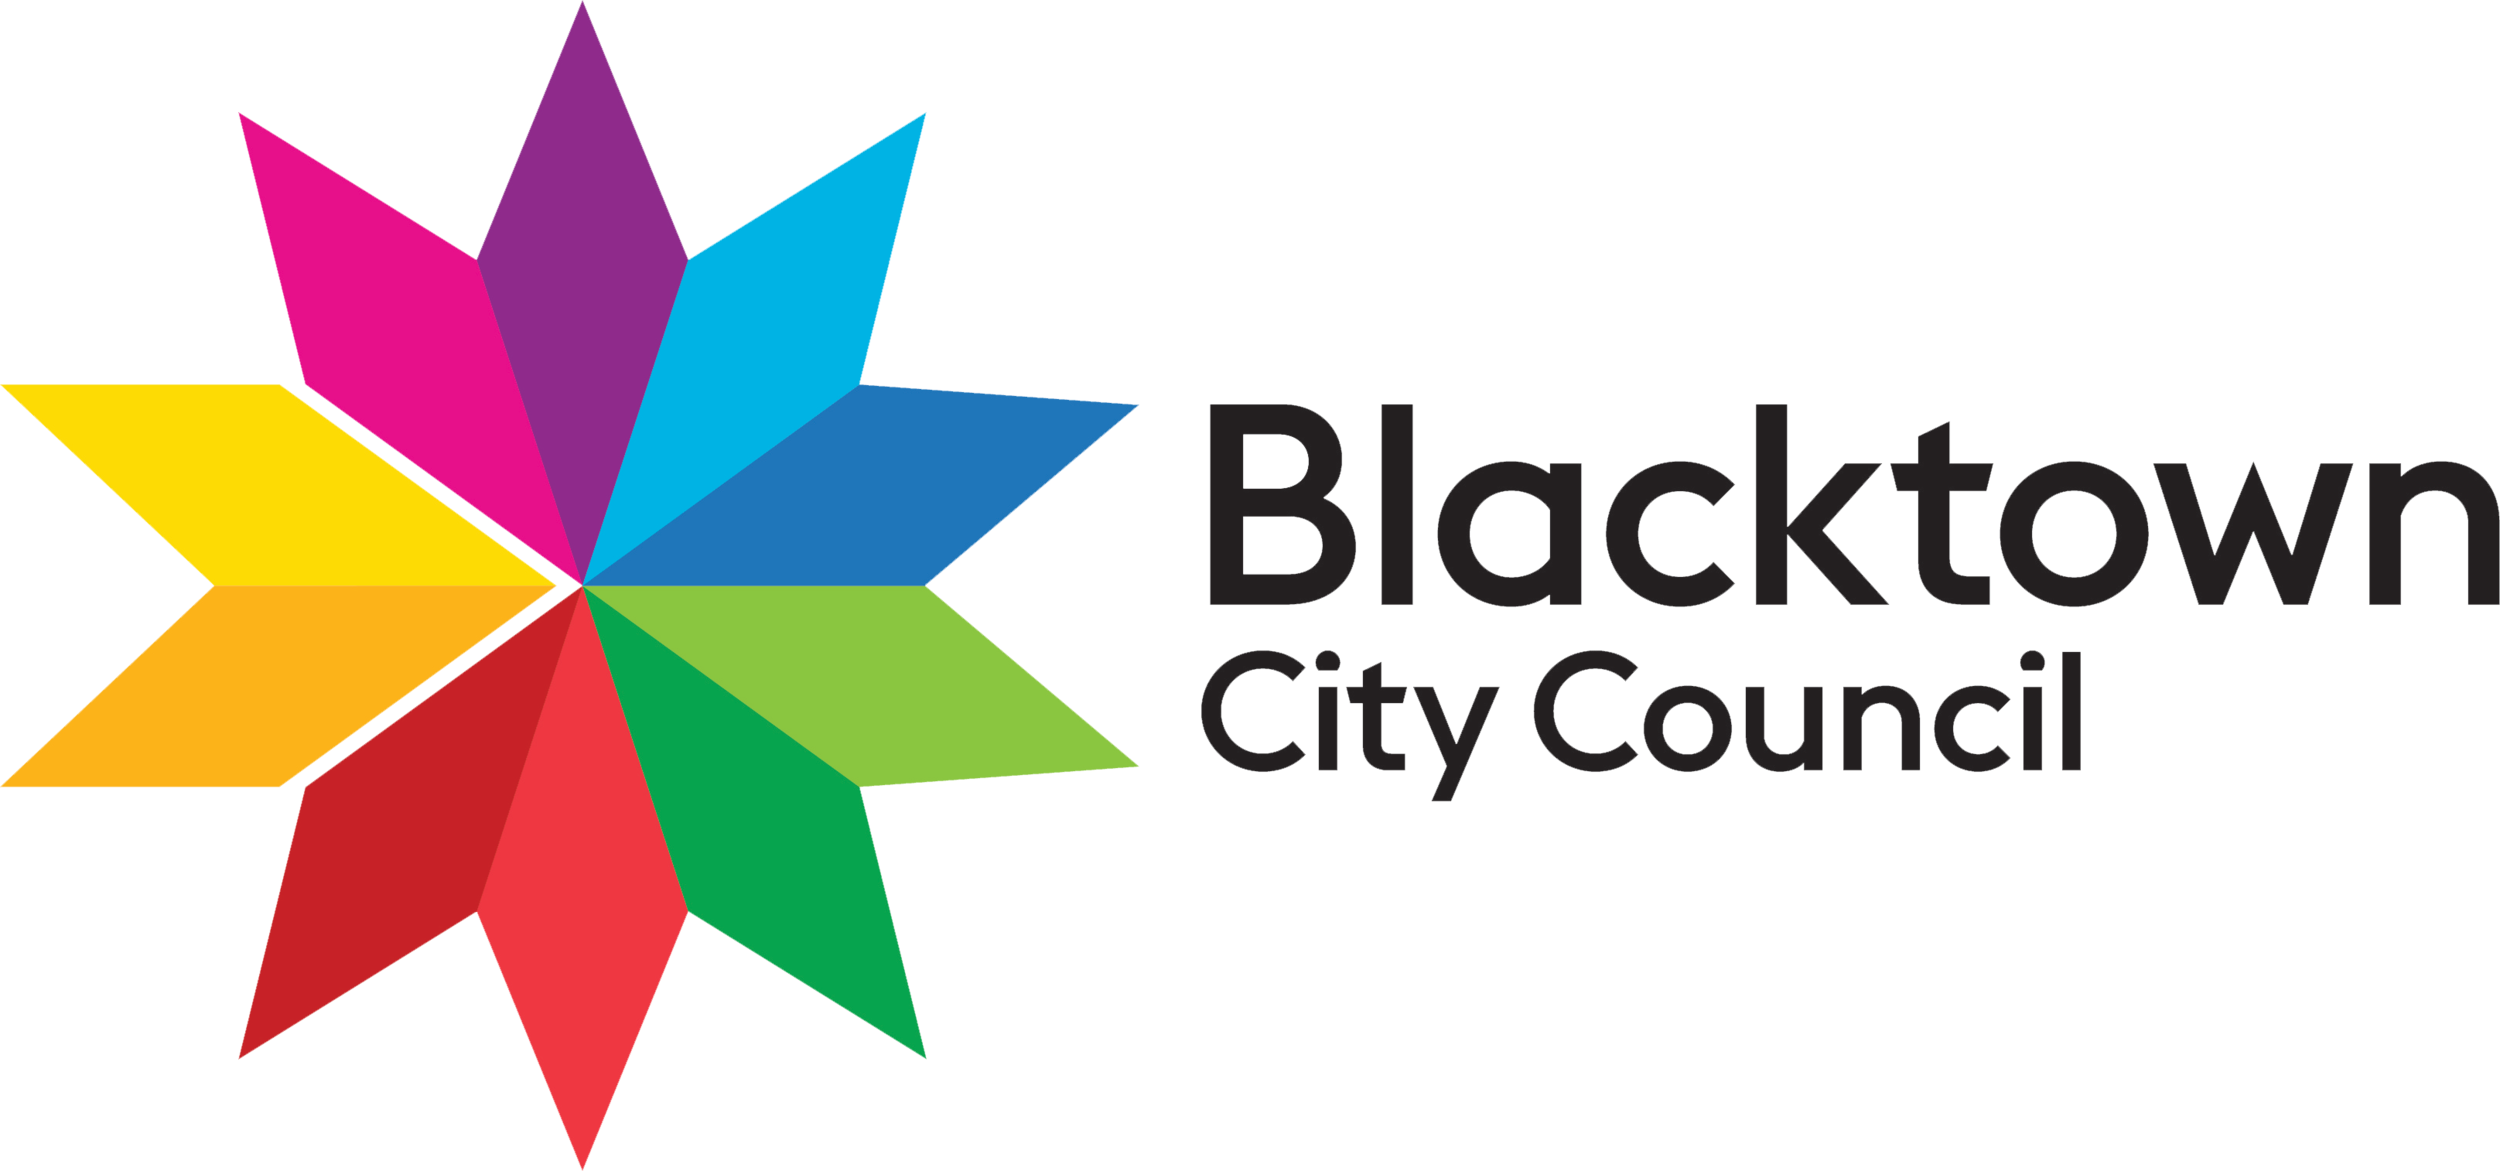 Blacktown Council.png